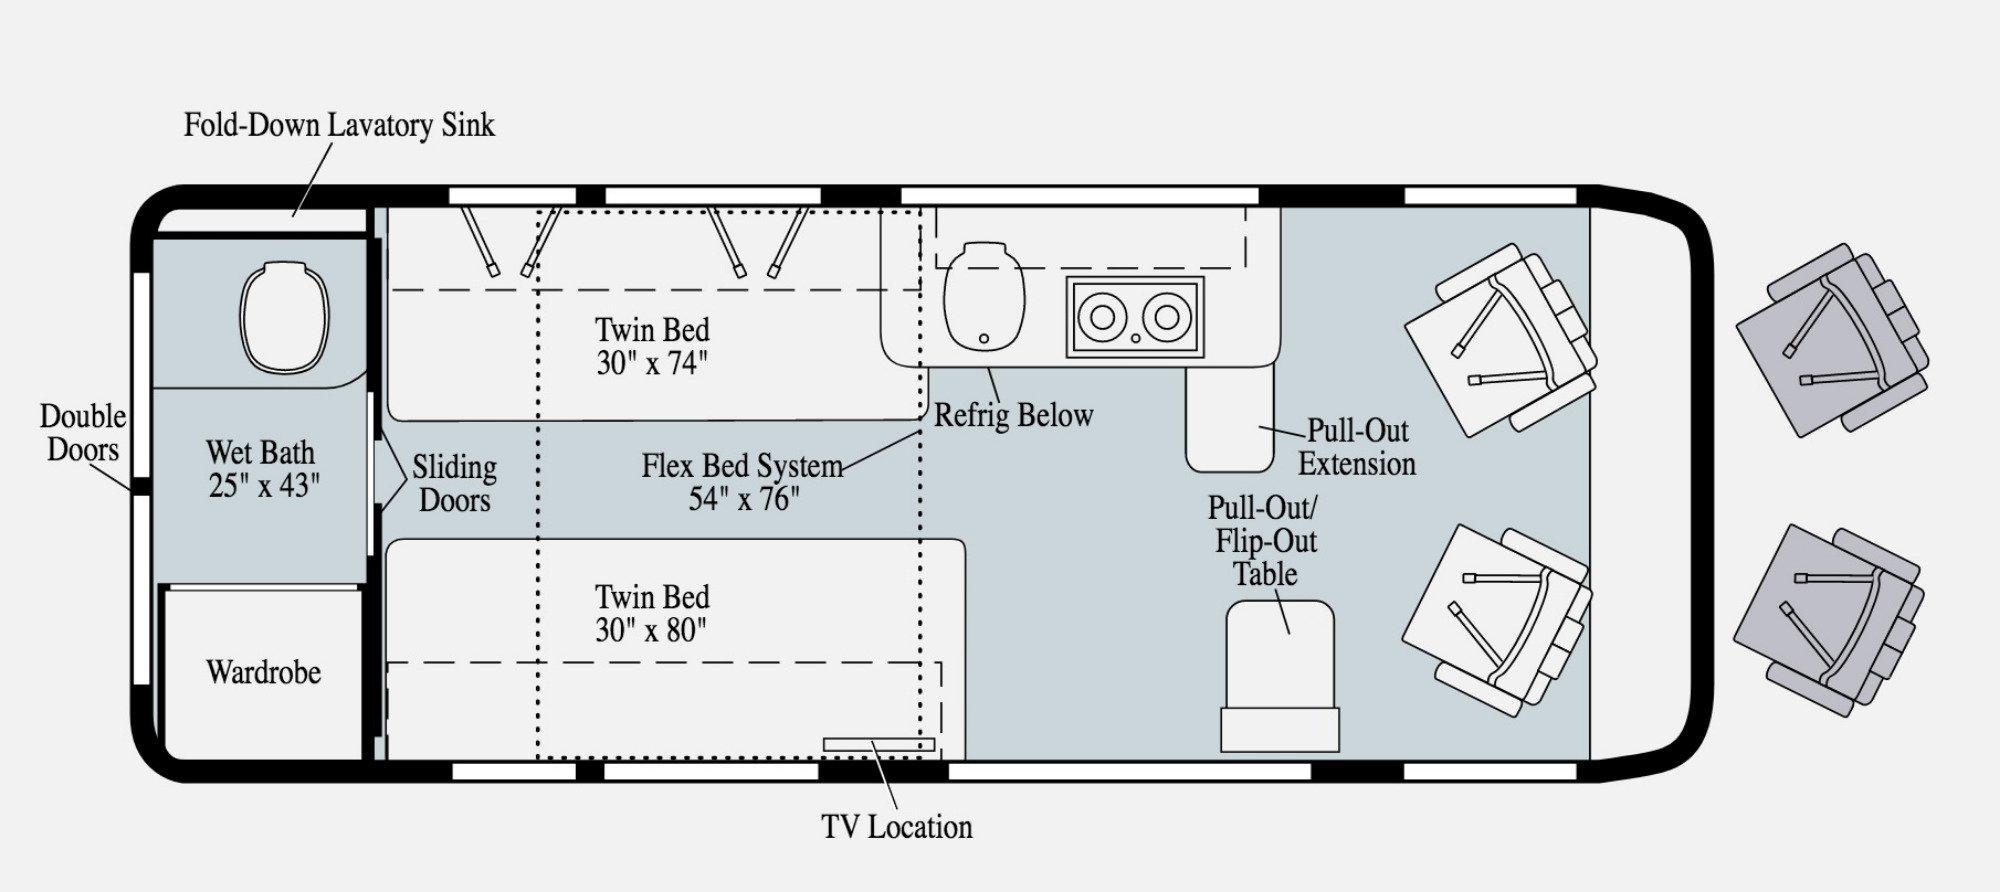 View Floor Plan for 2021 WINNEBAGO TRAVATO 59KL